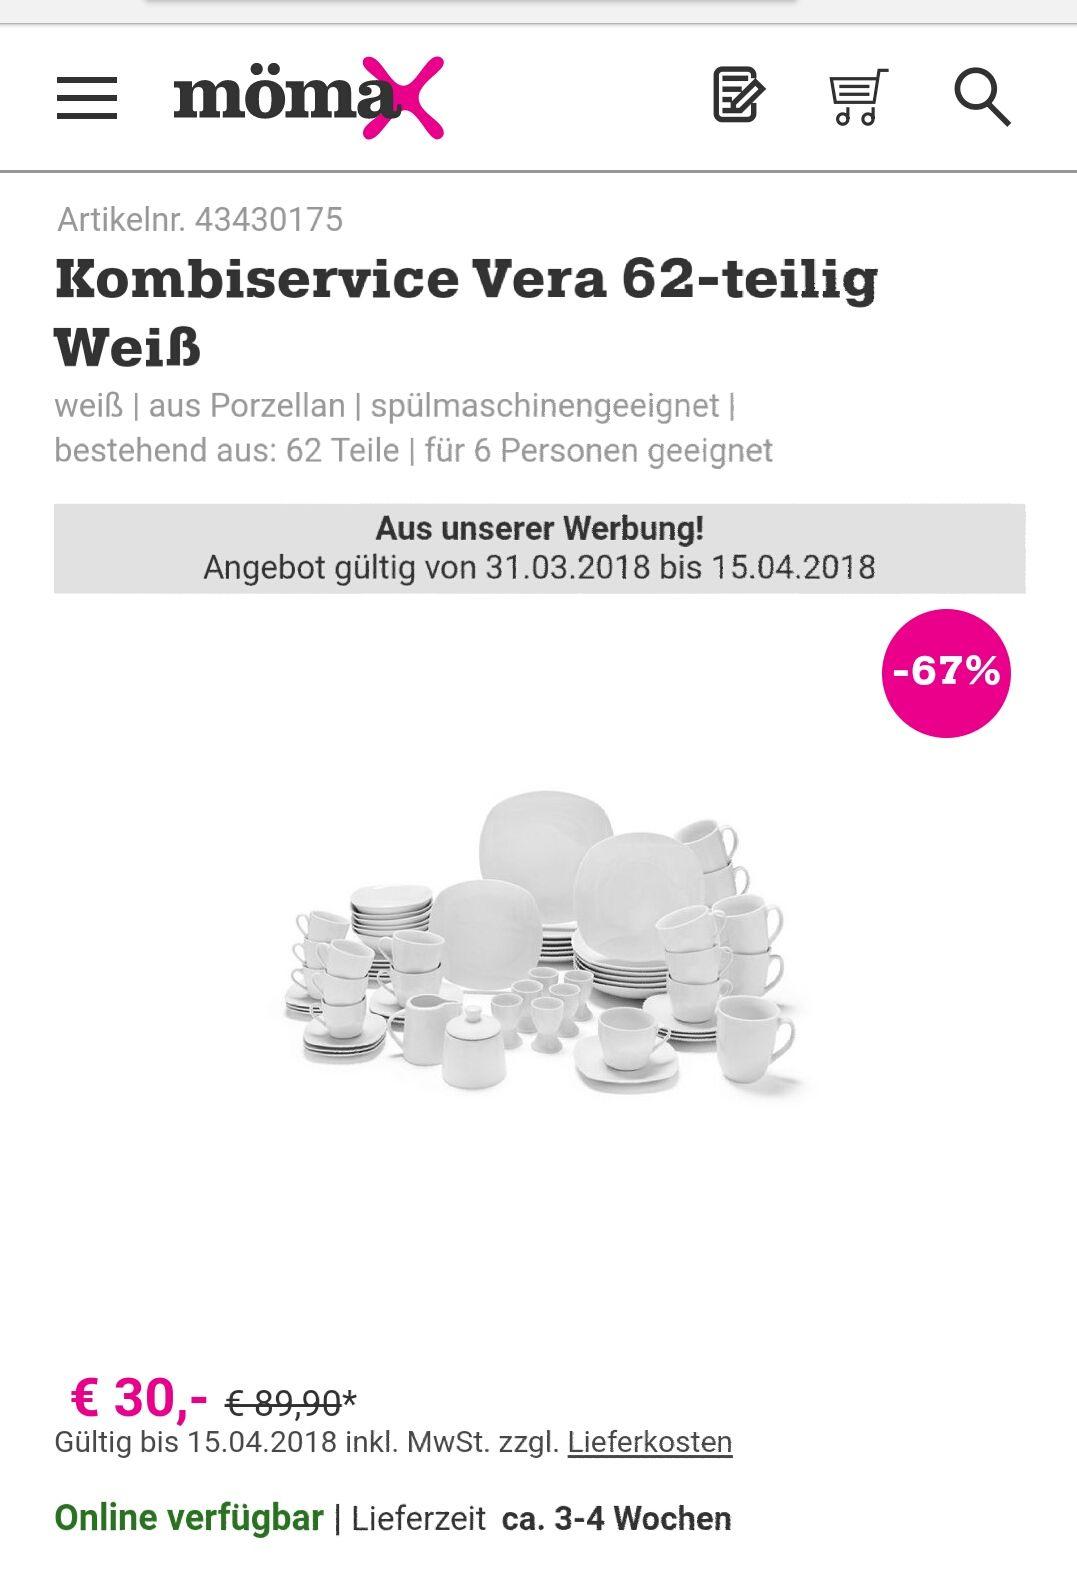 Vera 62-teilig Kombiservice